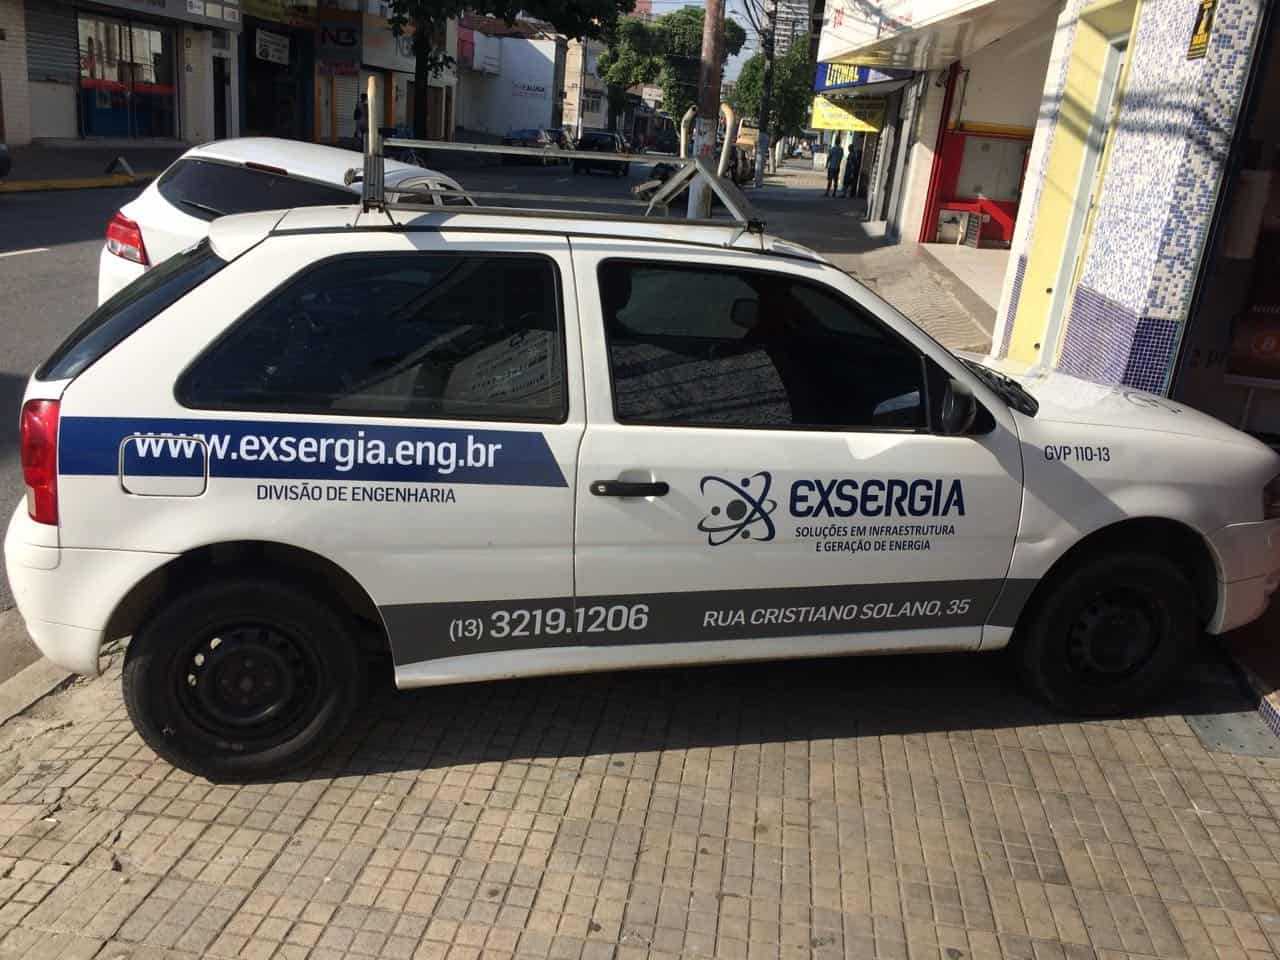 Veículo | Exsergia